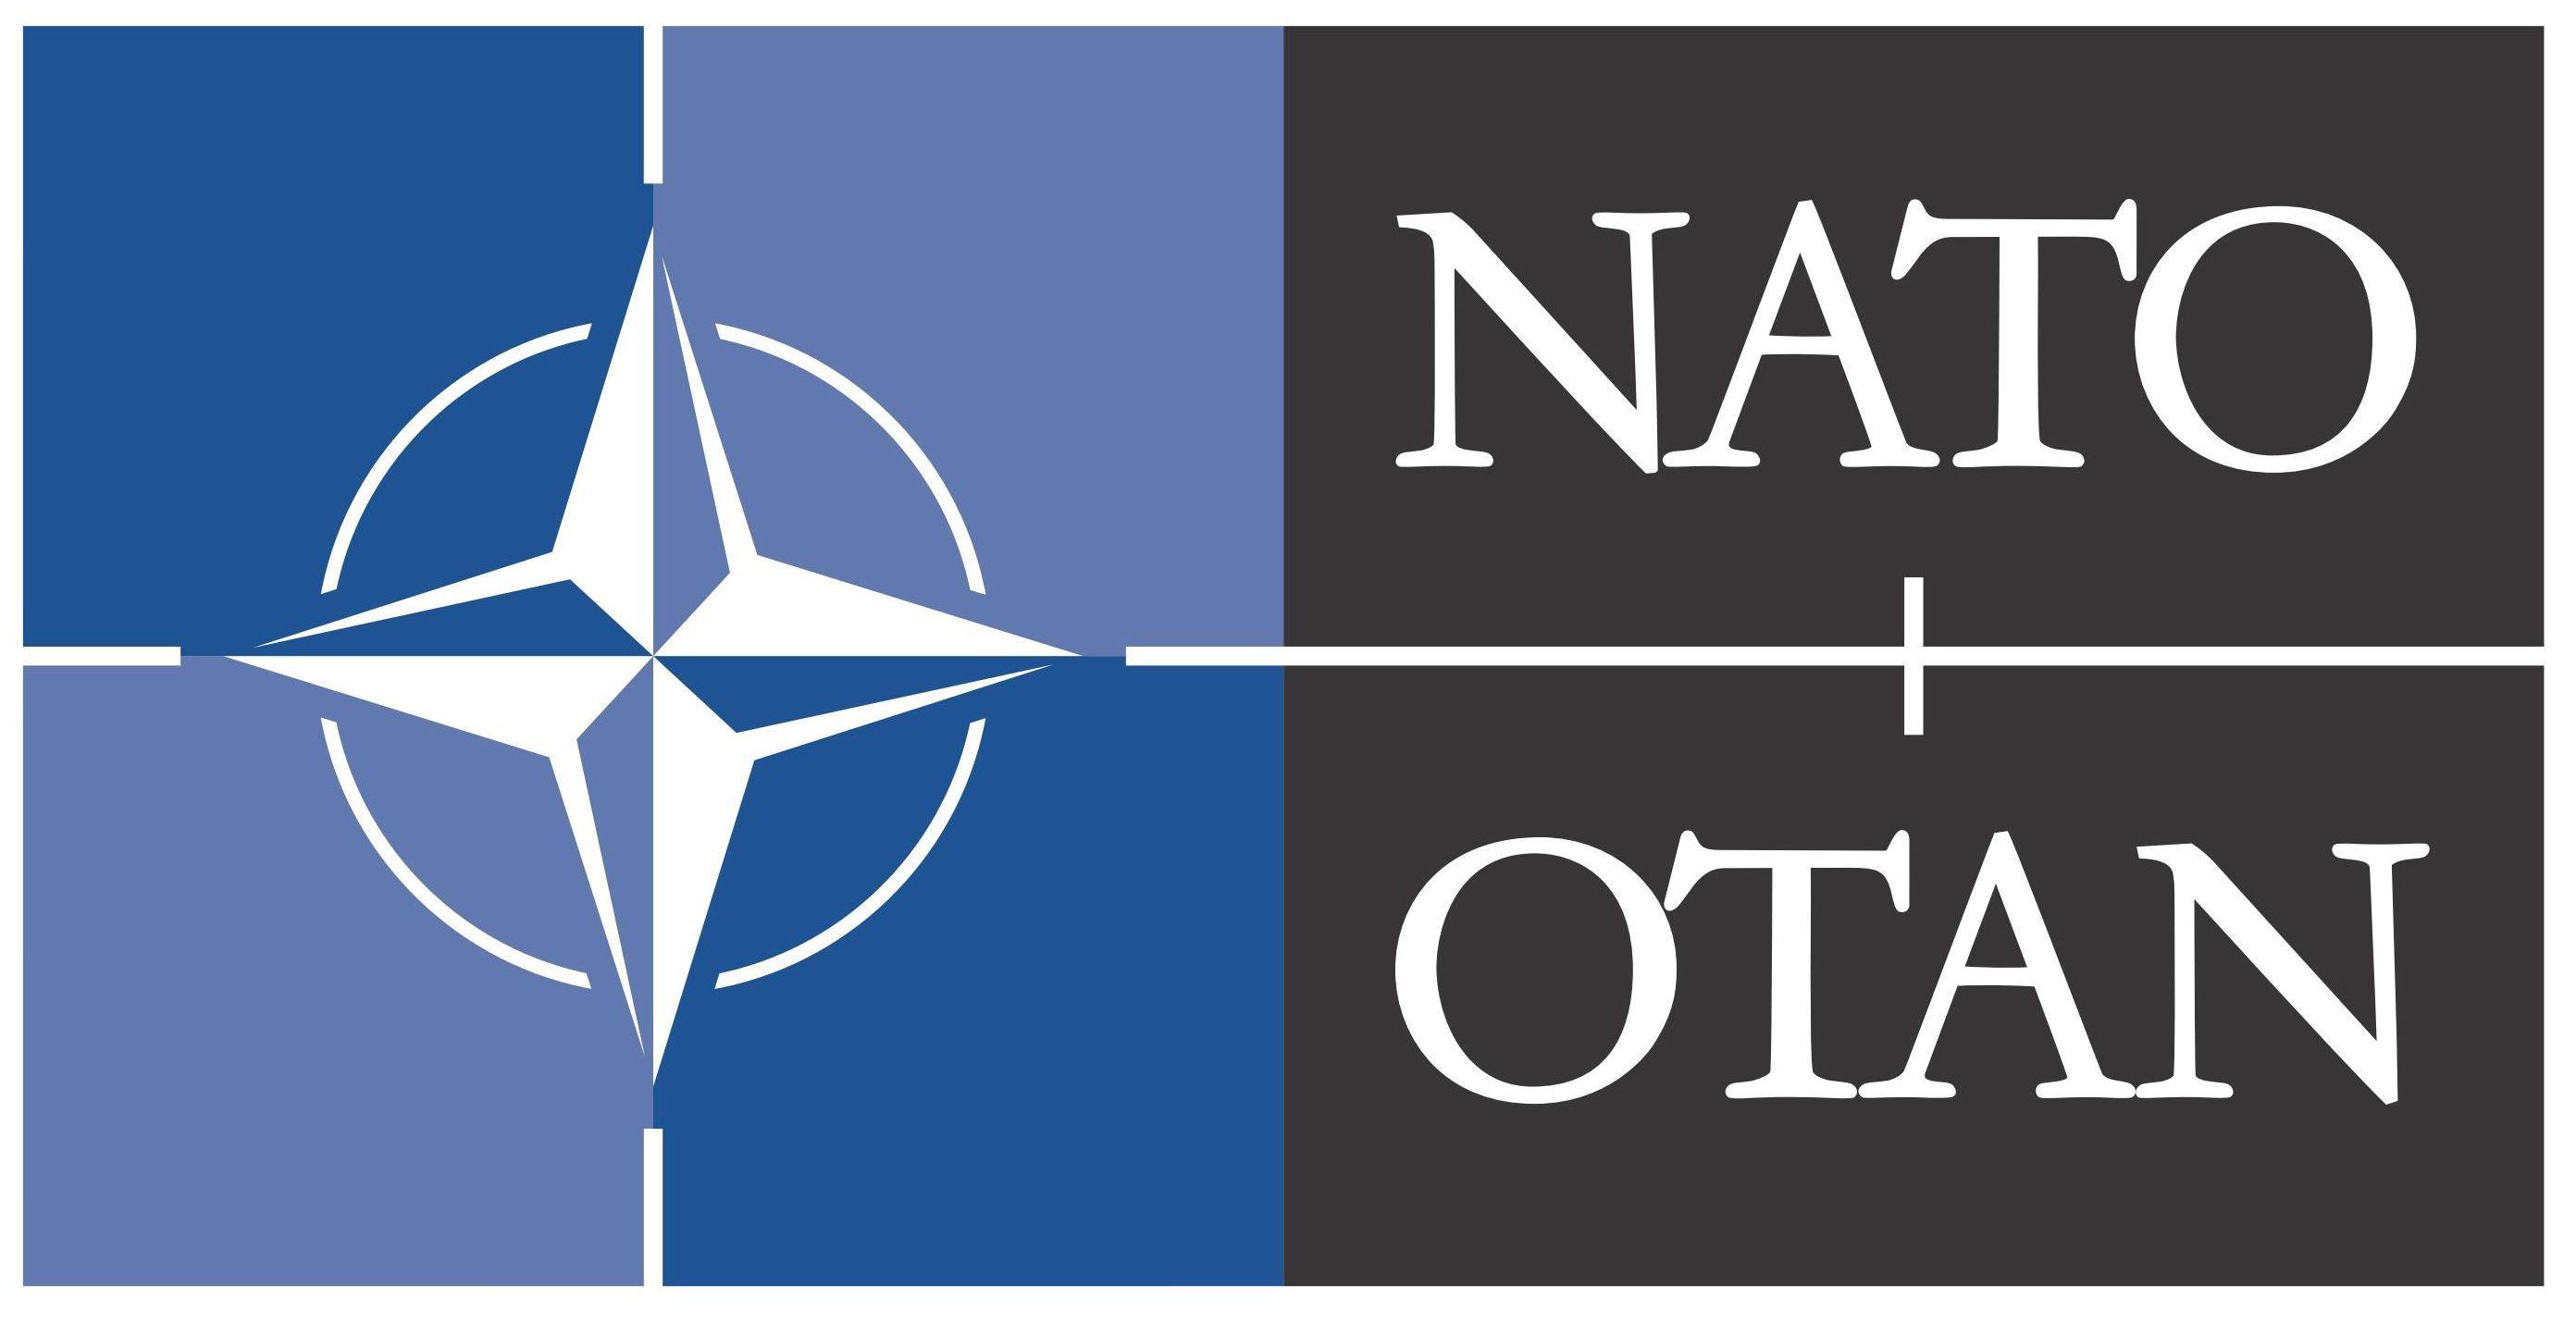 About the North Atlantic Treaty Organization (NATO)